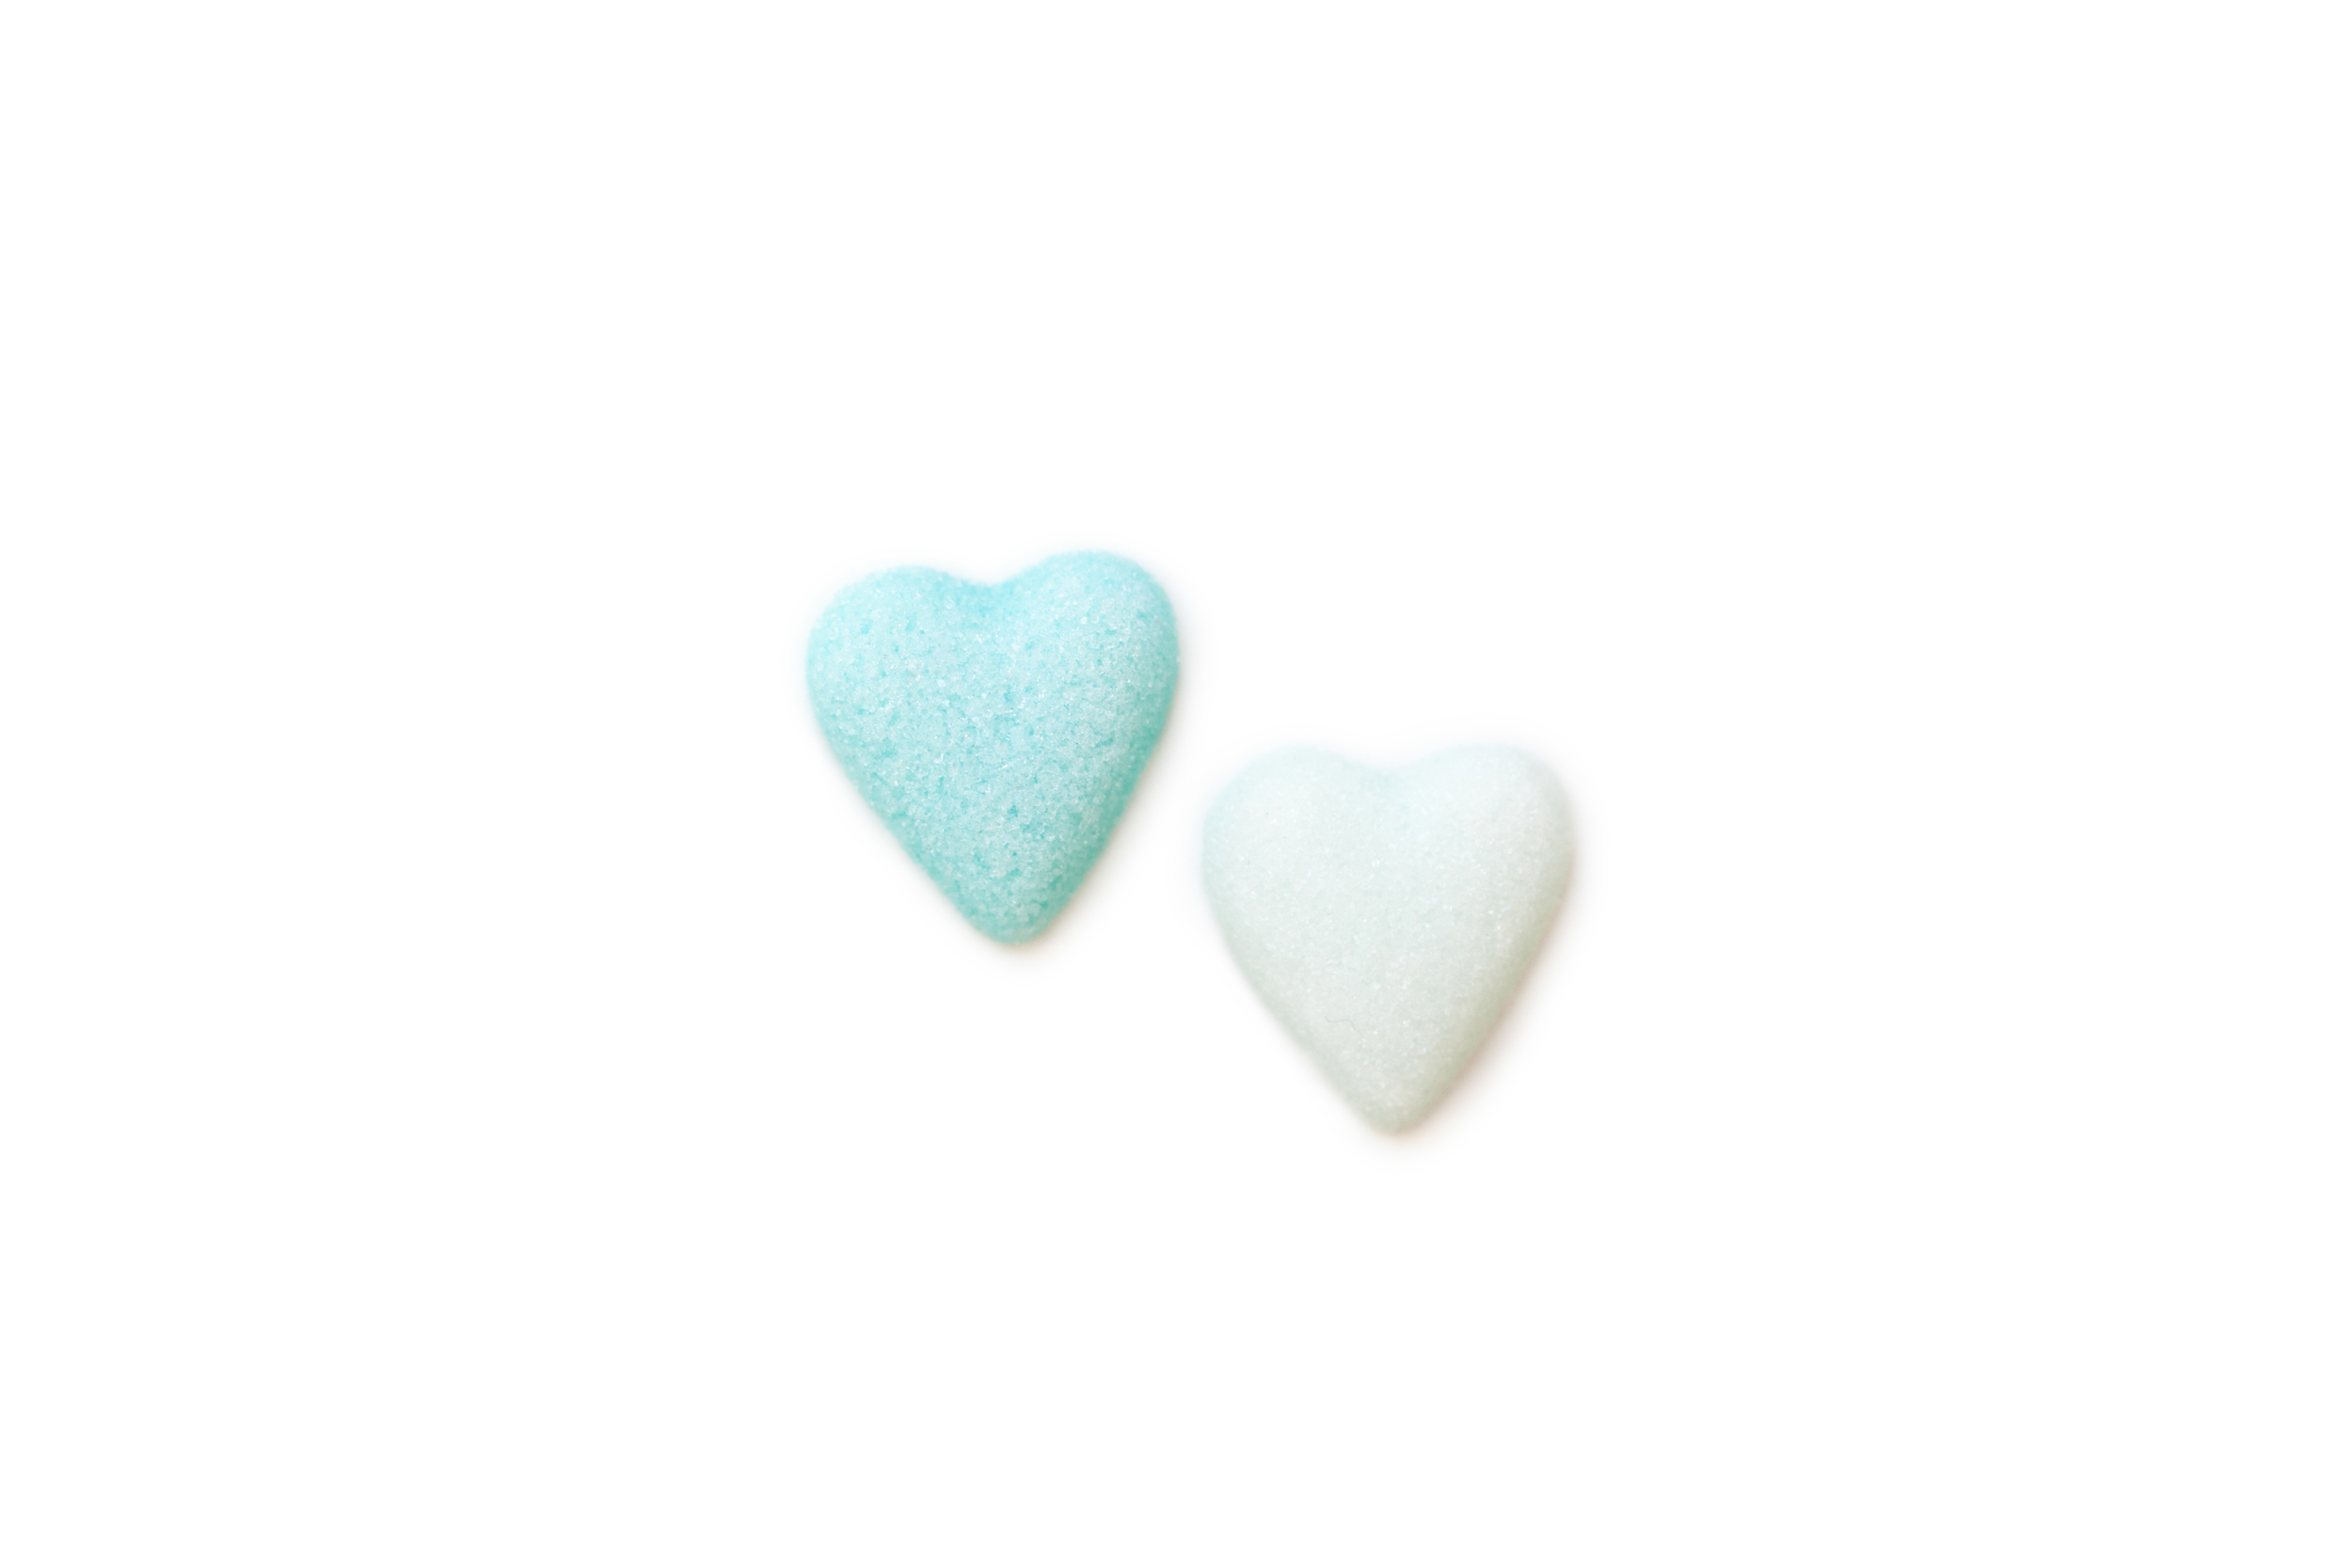 heart2blue.jpg